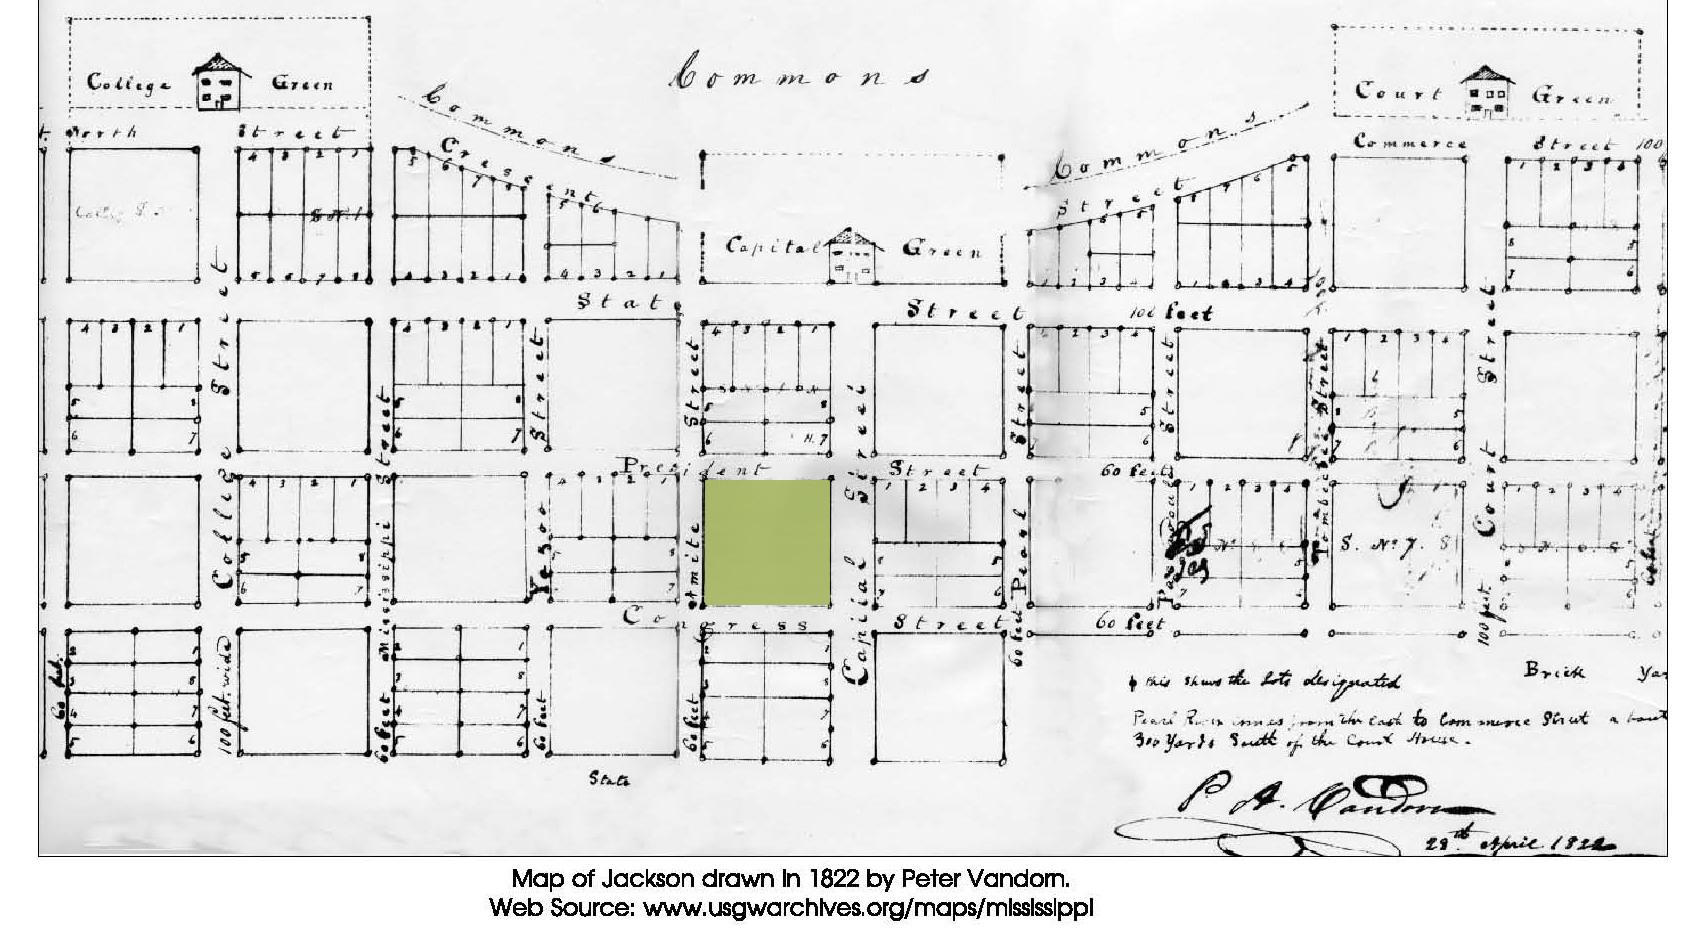 1822 vandorn plat ppcropped.jpg